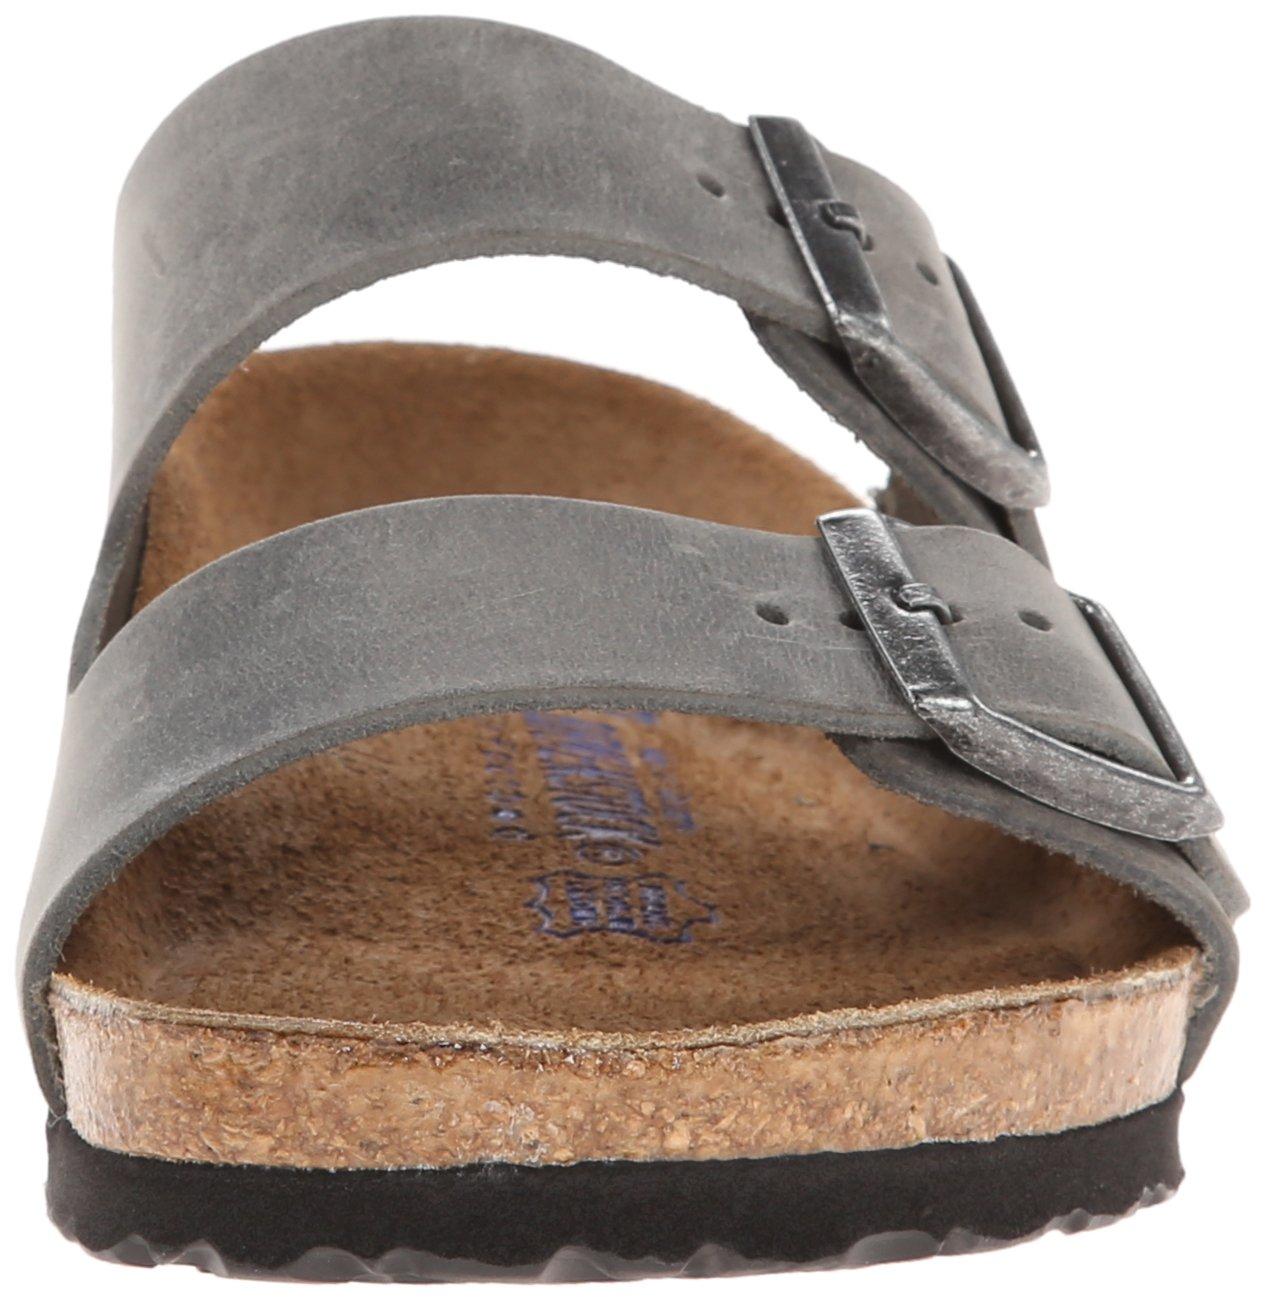 Birkenstock Unisex Arizona Iron Oiled Leather Sandals - 45 M EU/12-12.5 B(M) US Men by Birkenstock (Image #4)